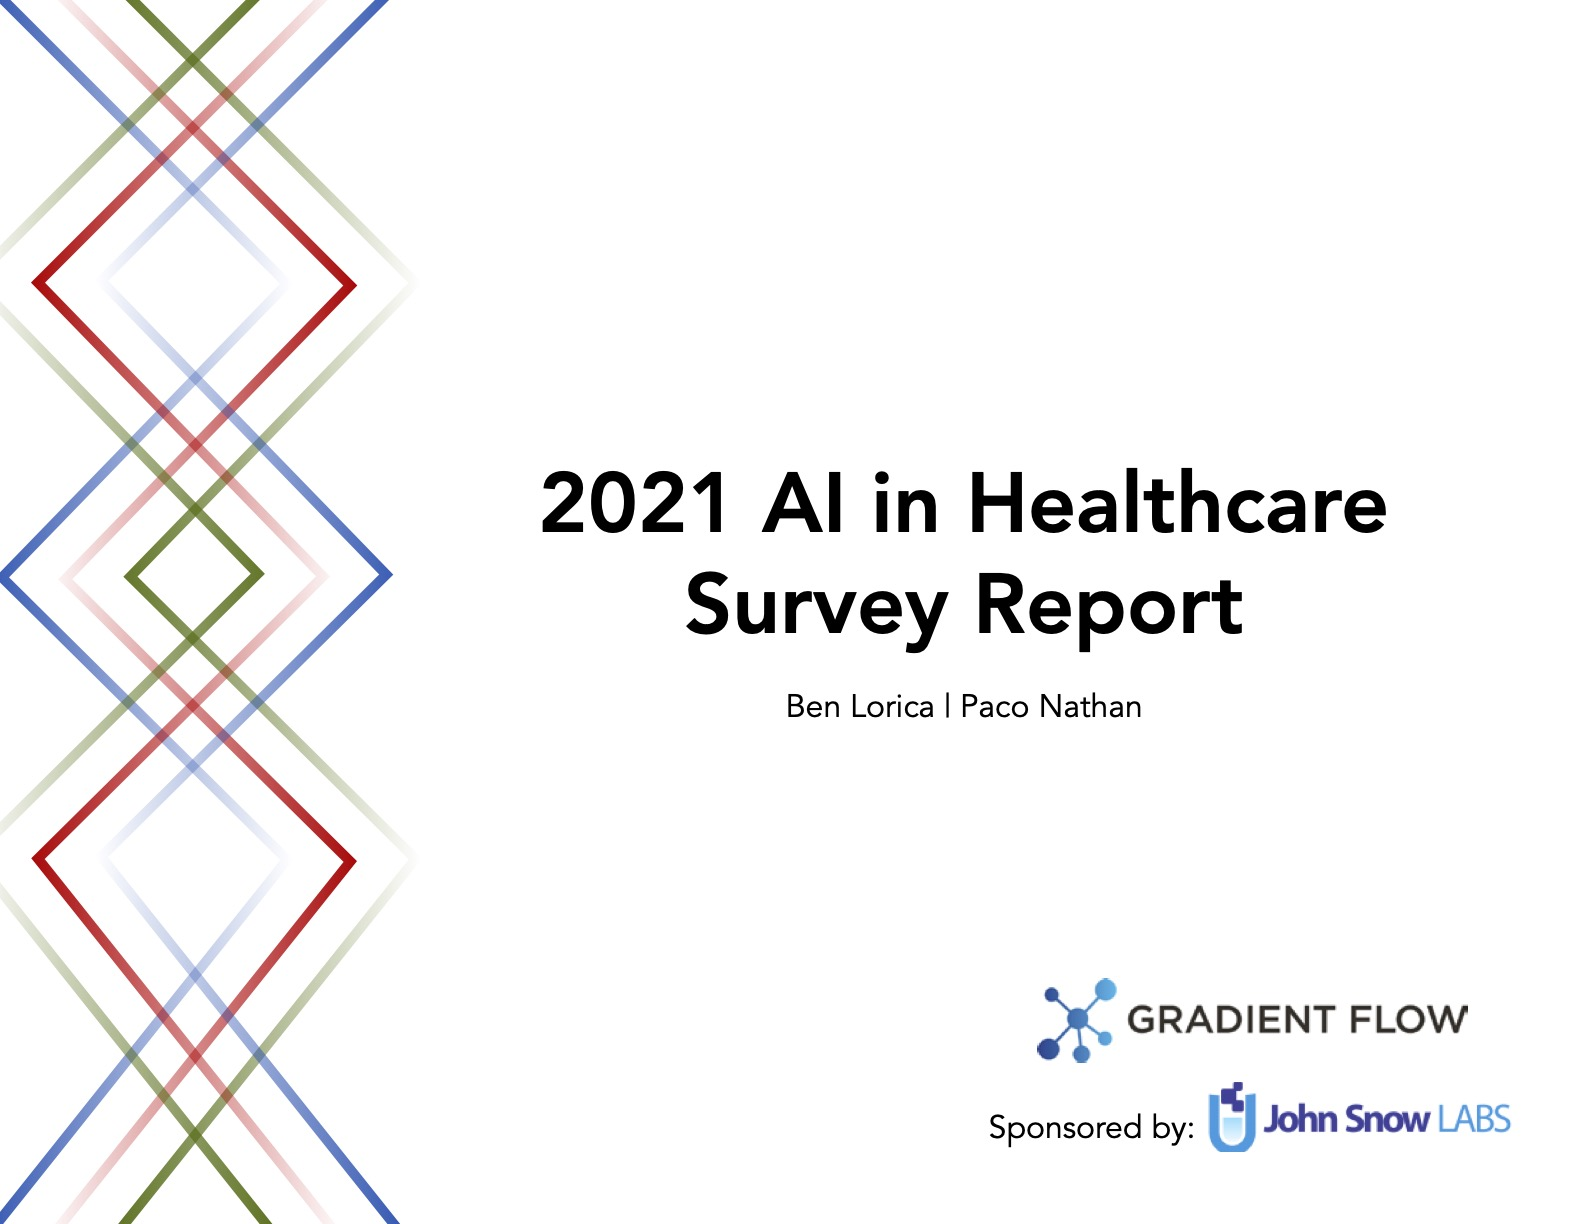 2021 AI in Healthcare Survey Report - Gradient Flow